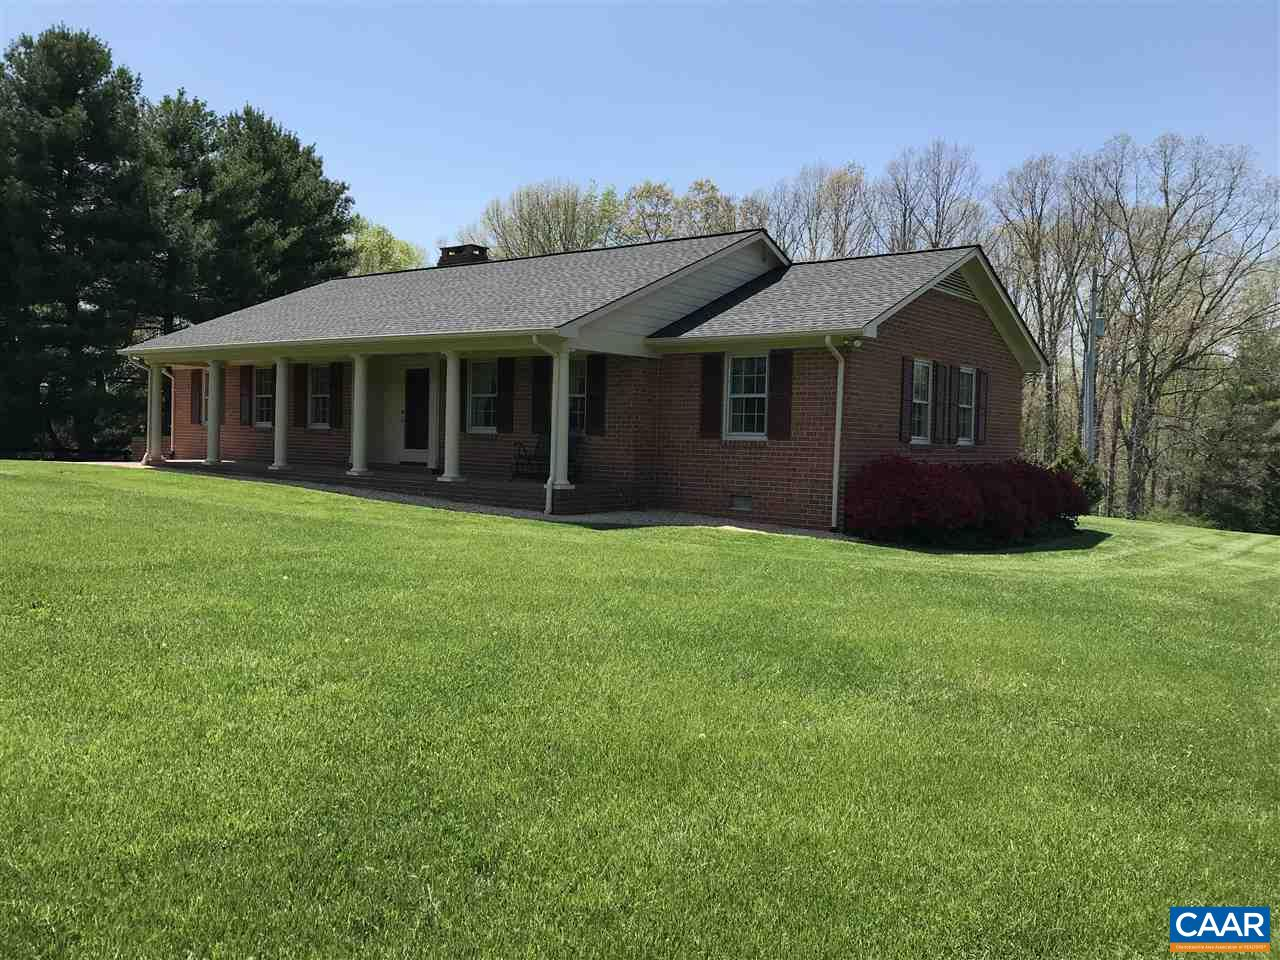 home for sale , MLS #565203, 1224 Paynes Landing Rd